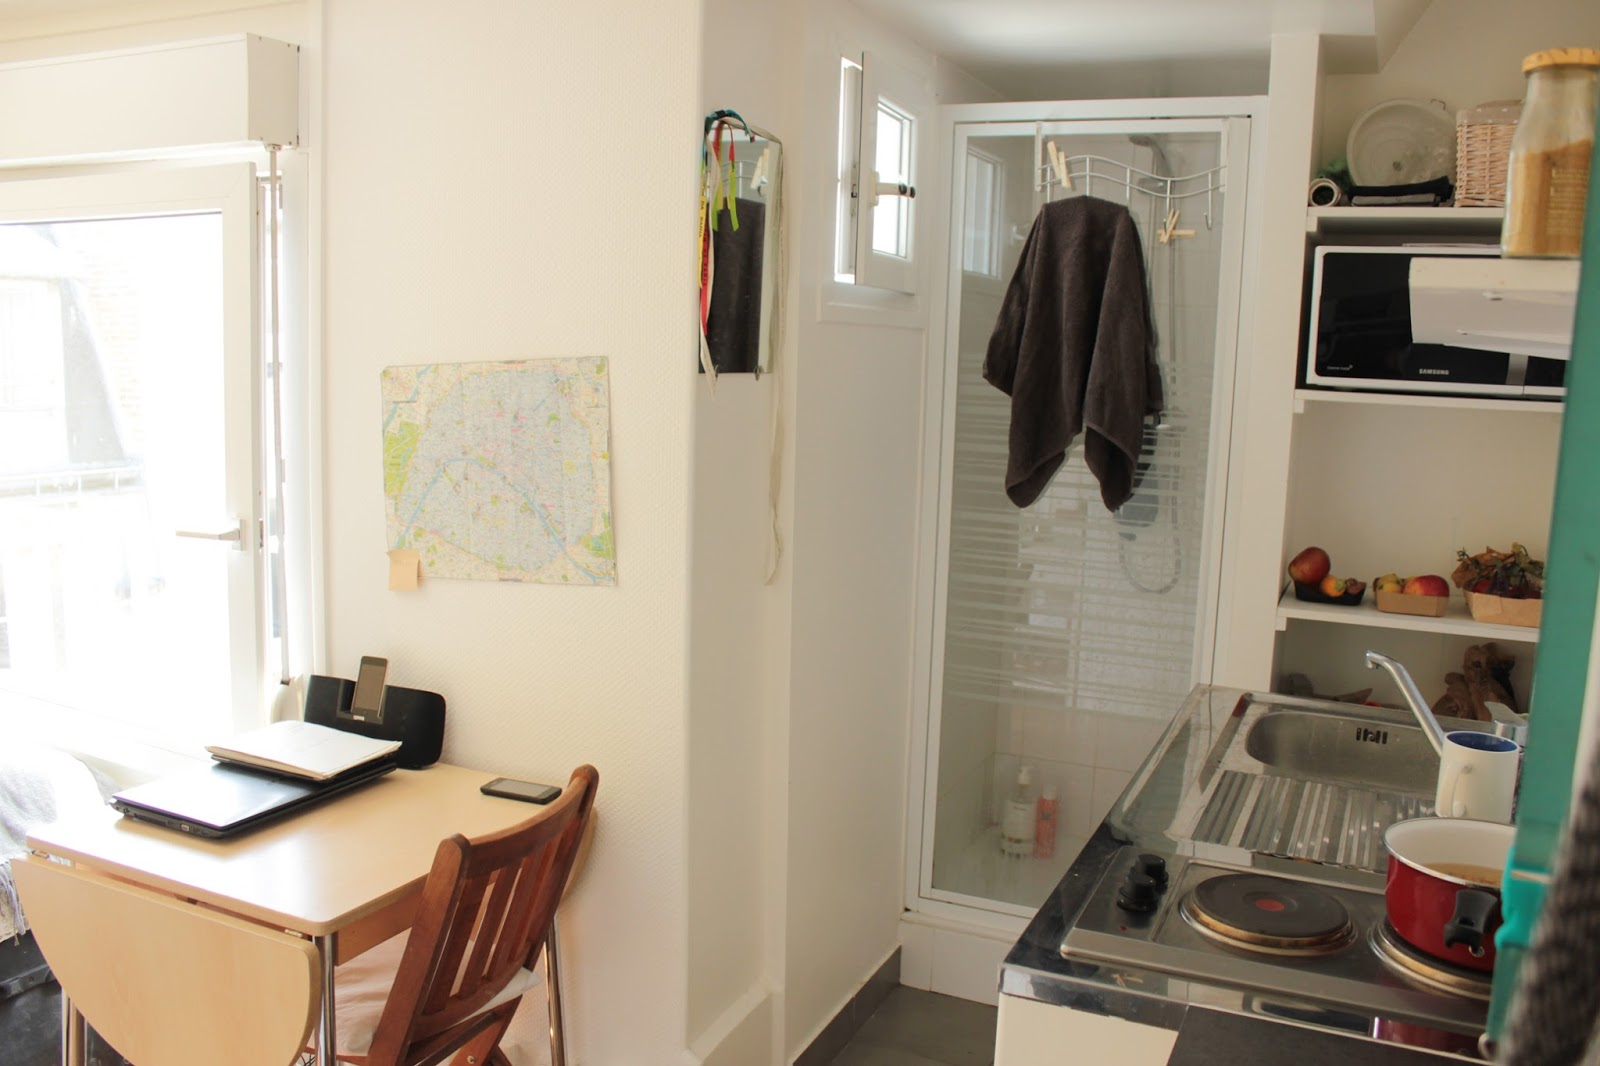 Tiny house: zero waste wonen op 10m2   e m m a   j o h n